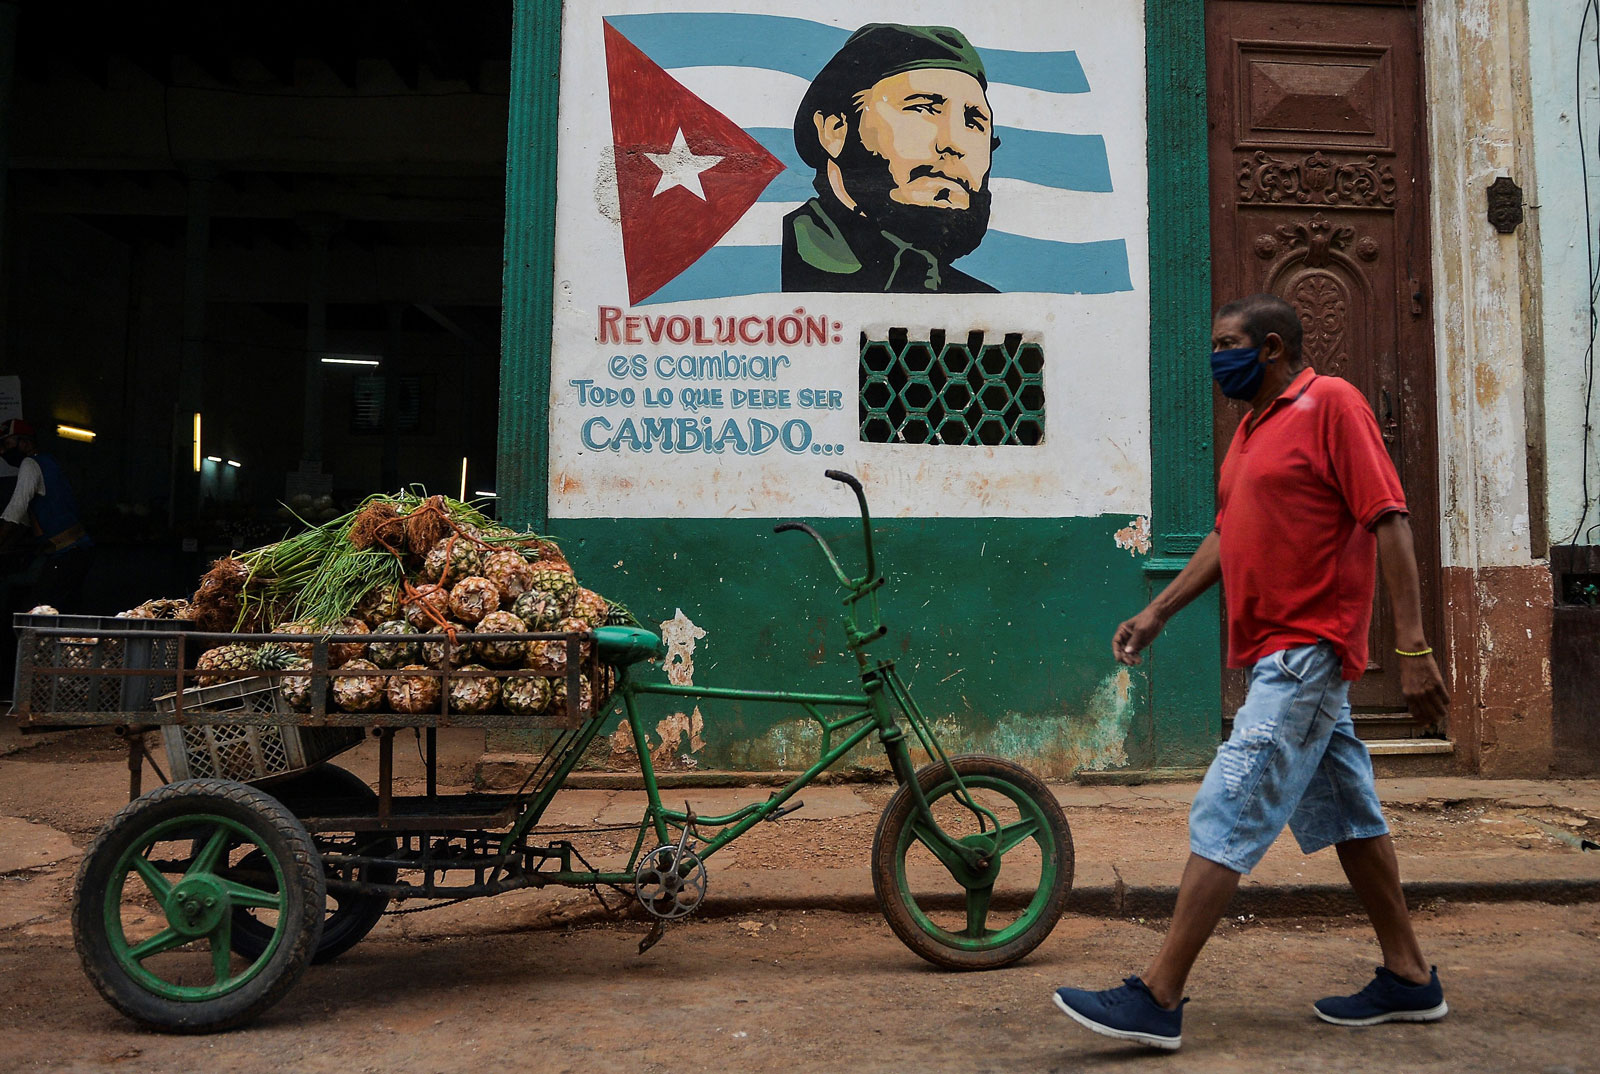 A man wearing a face mask walks by a mural depicting Fidel Castro in Havana, Cuba, May 13, 2020